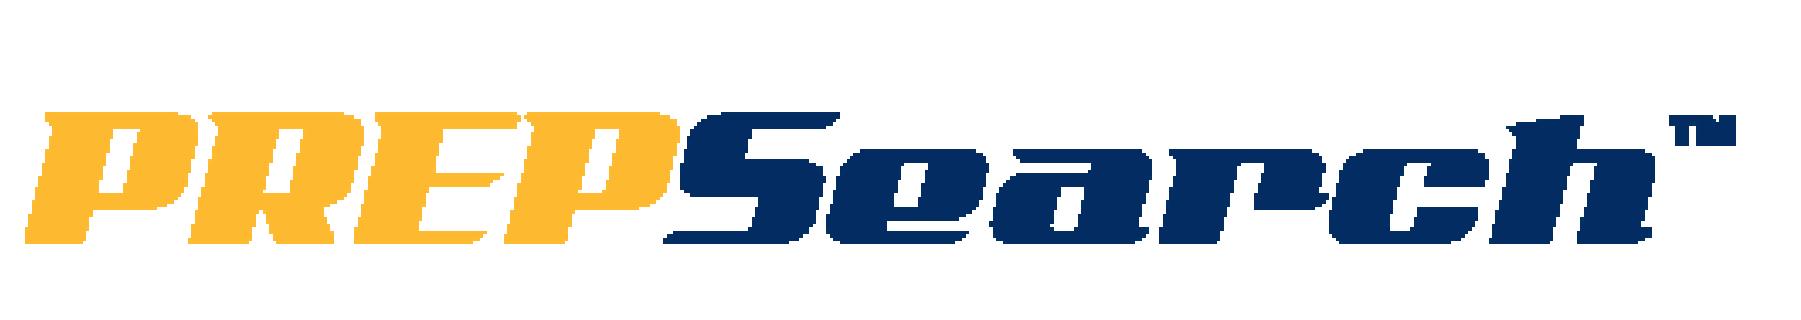 Enzley-Mitchell-IV-PREPSearch-Logo2017-01